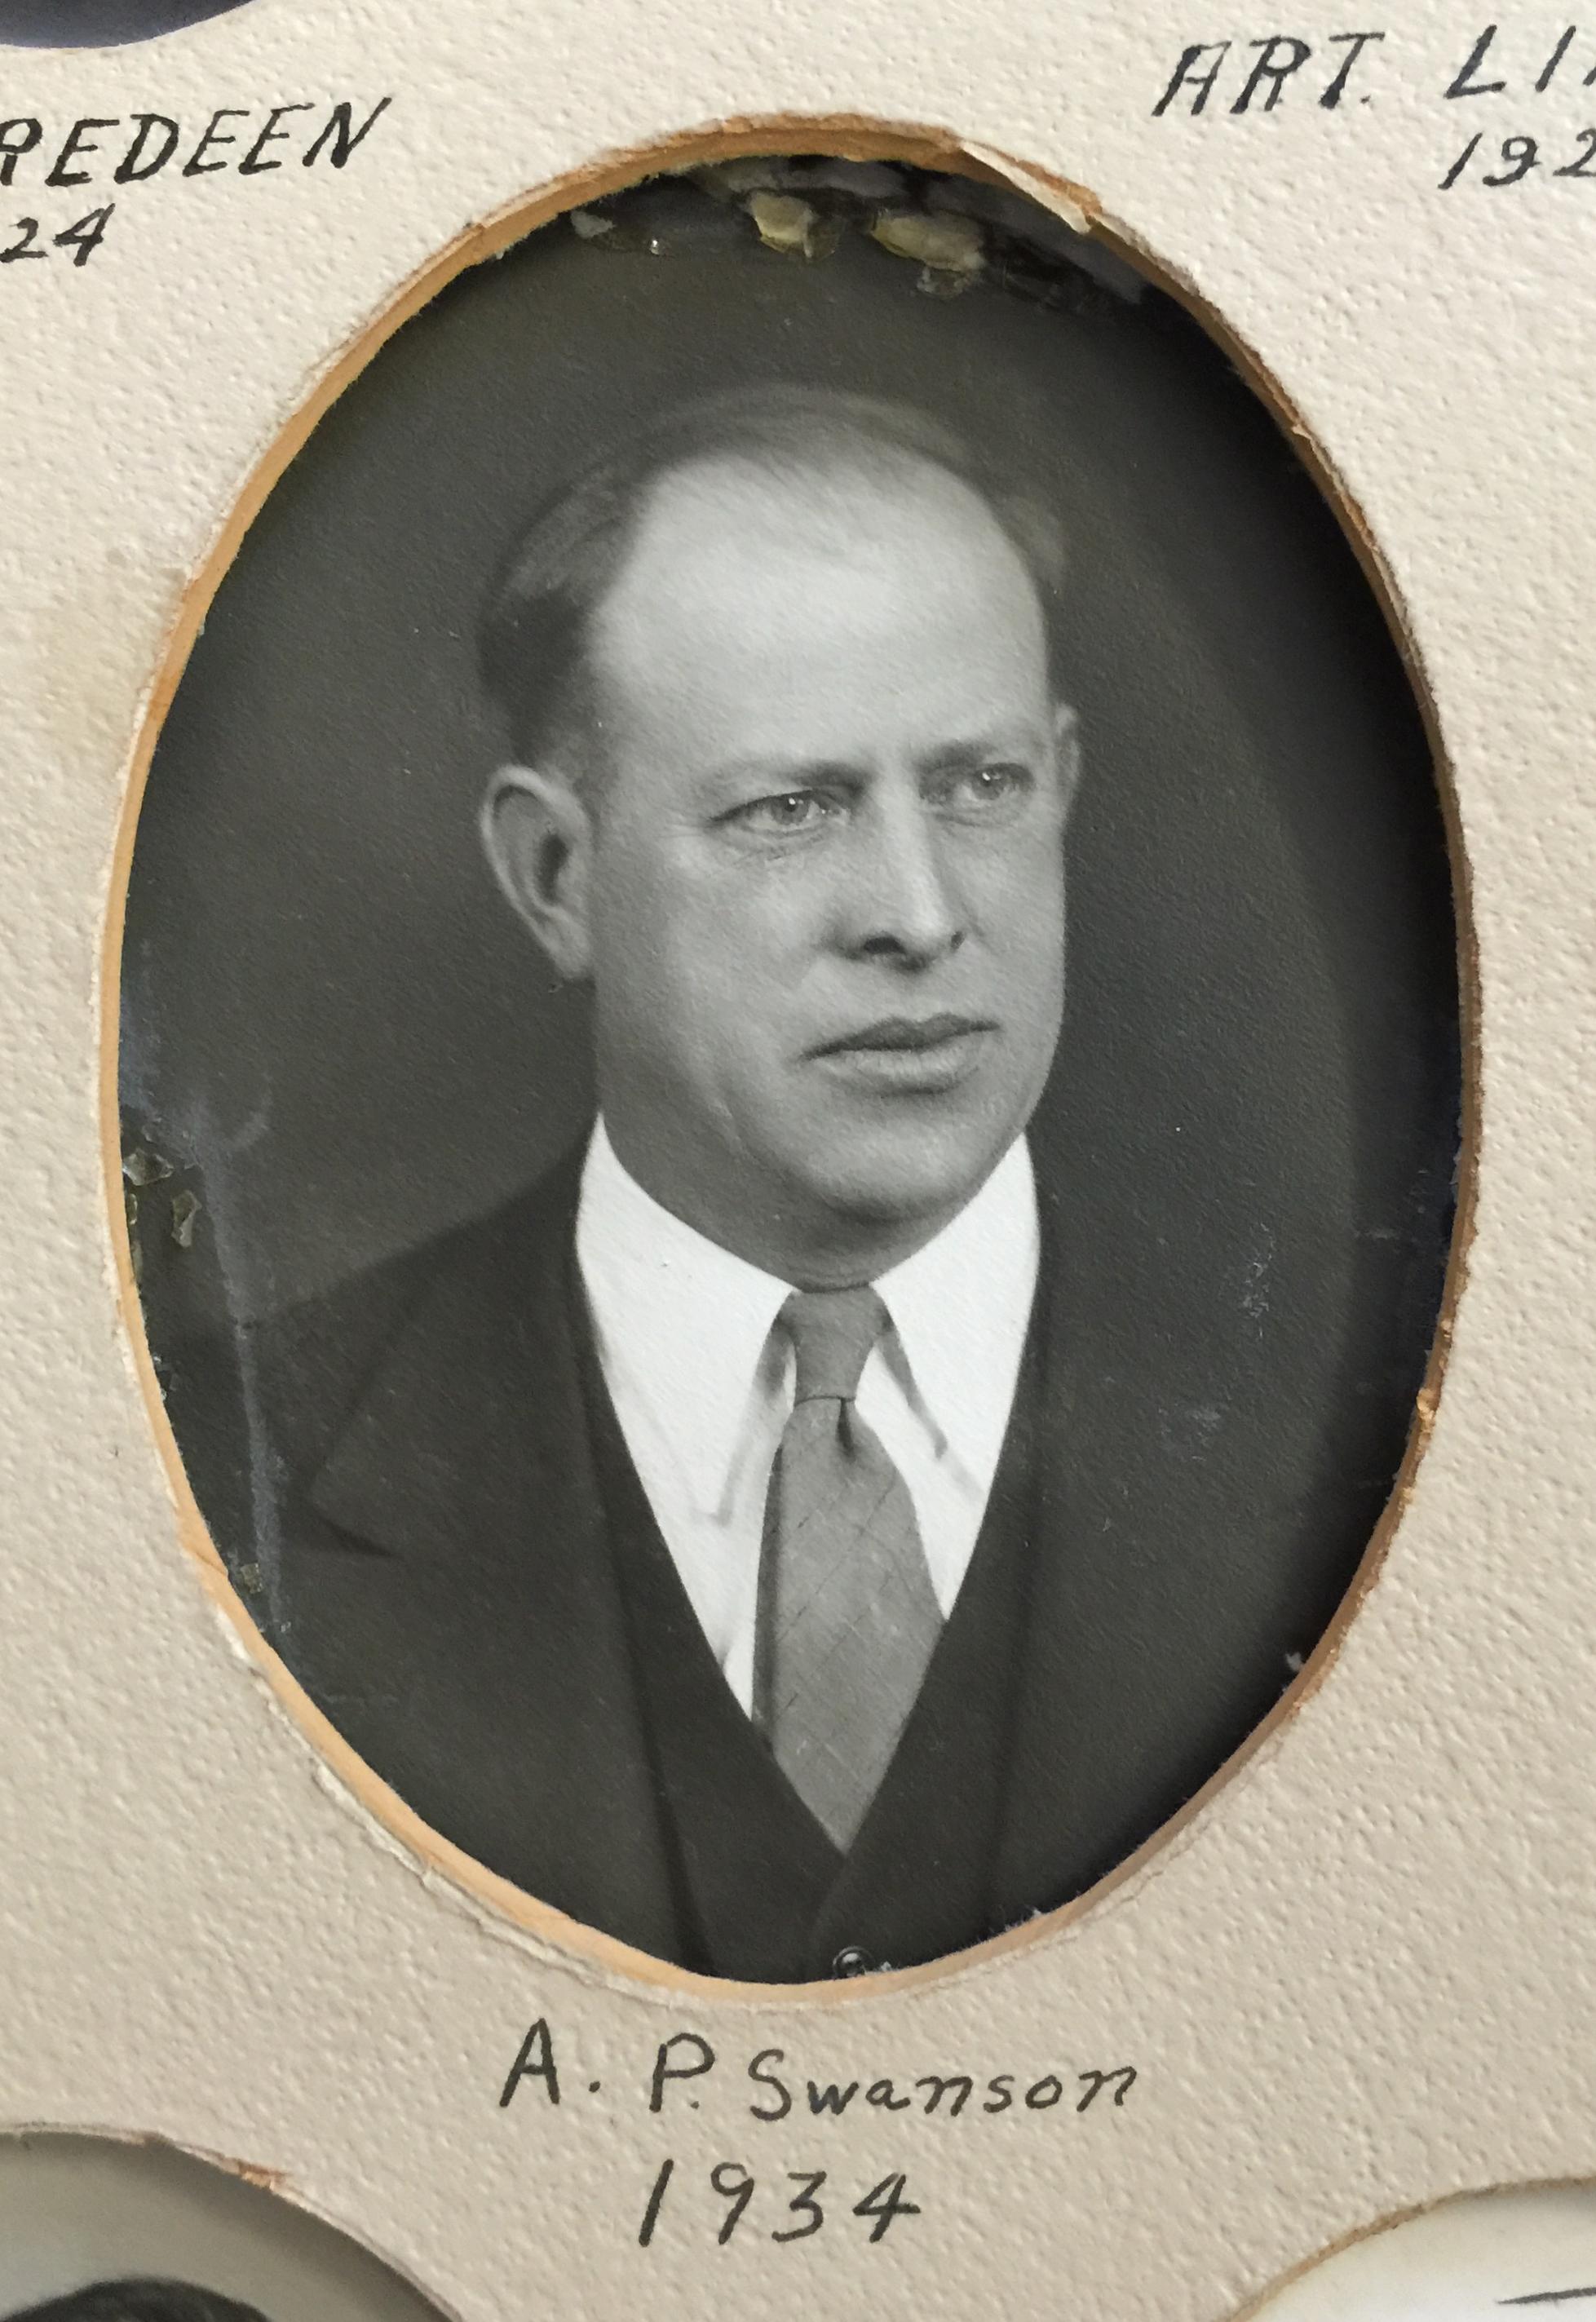 1934 A.P. Swanson